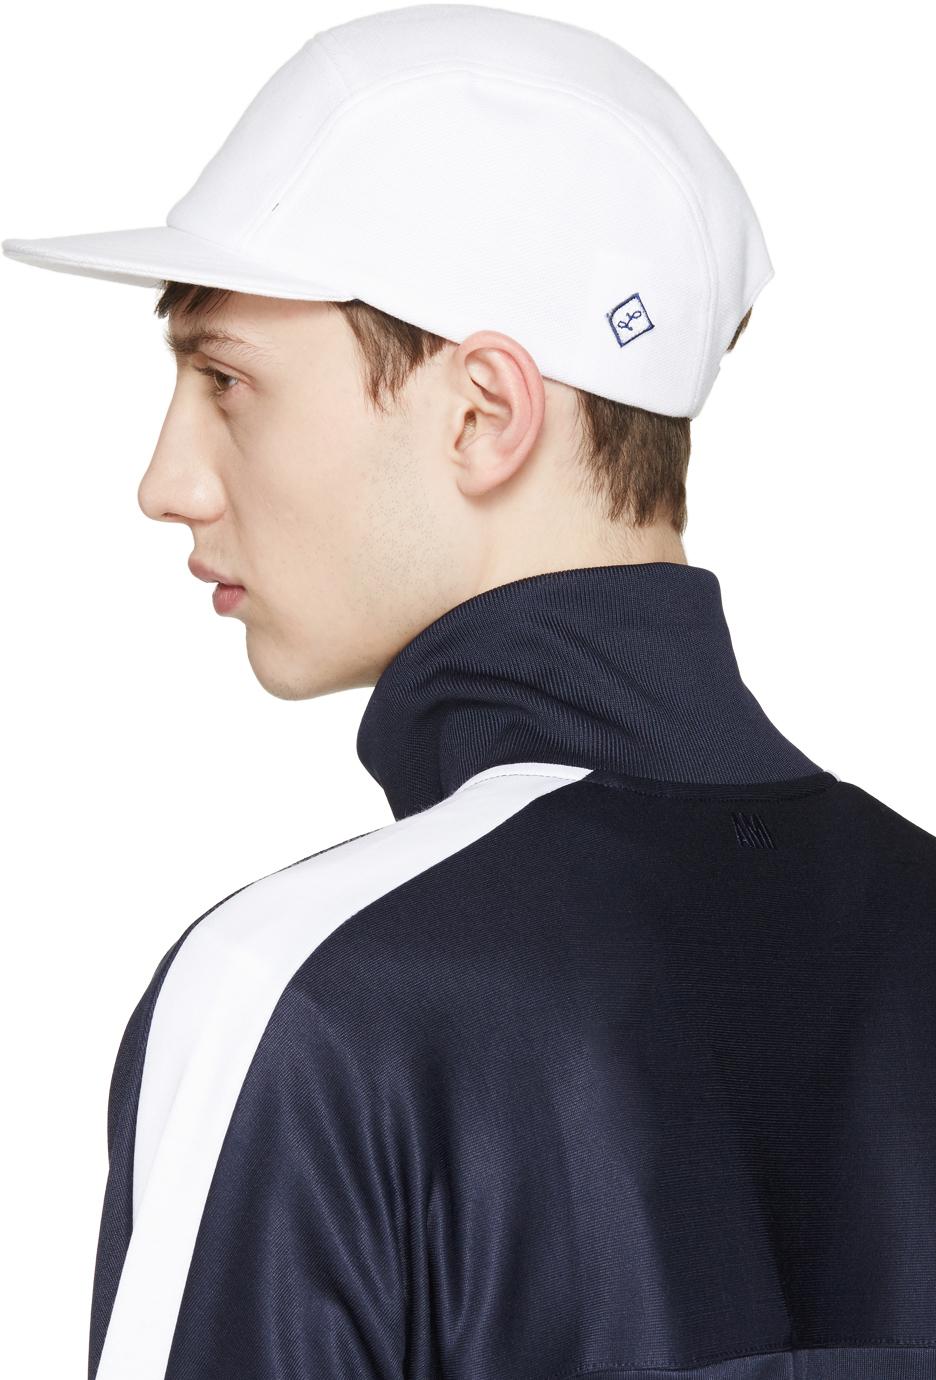 larose men Buy larose men's black rabbit-felt traveller hat, starting at $119 similar products also available sale now on.